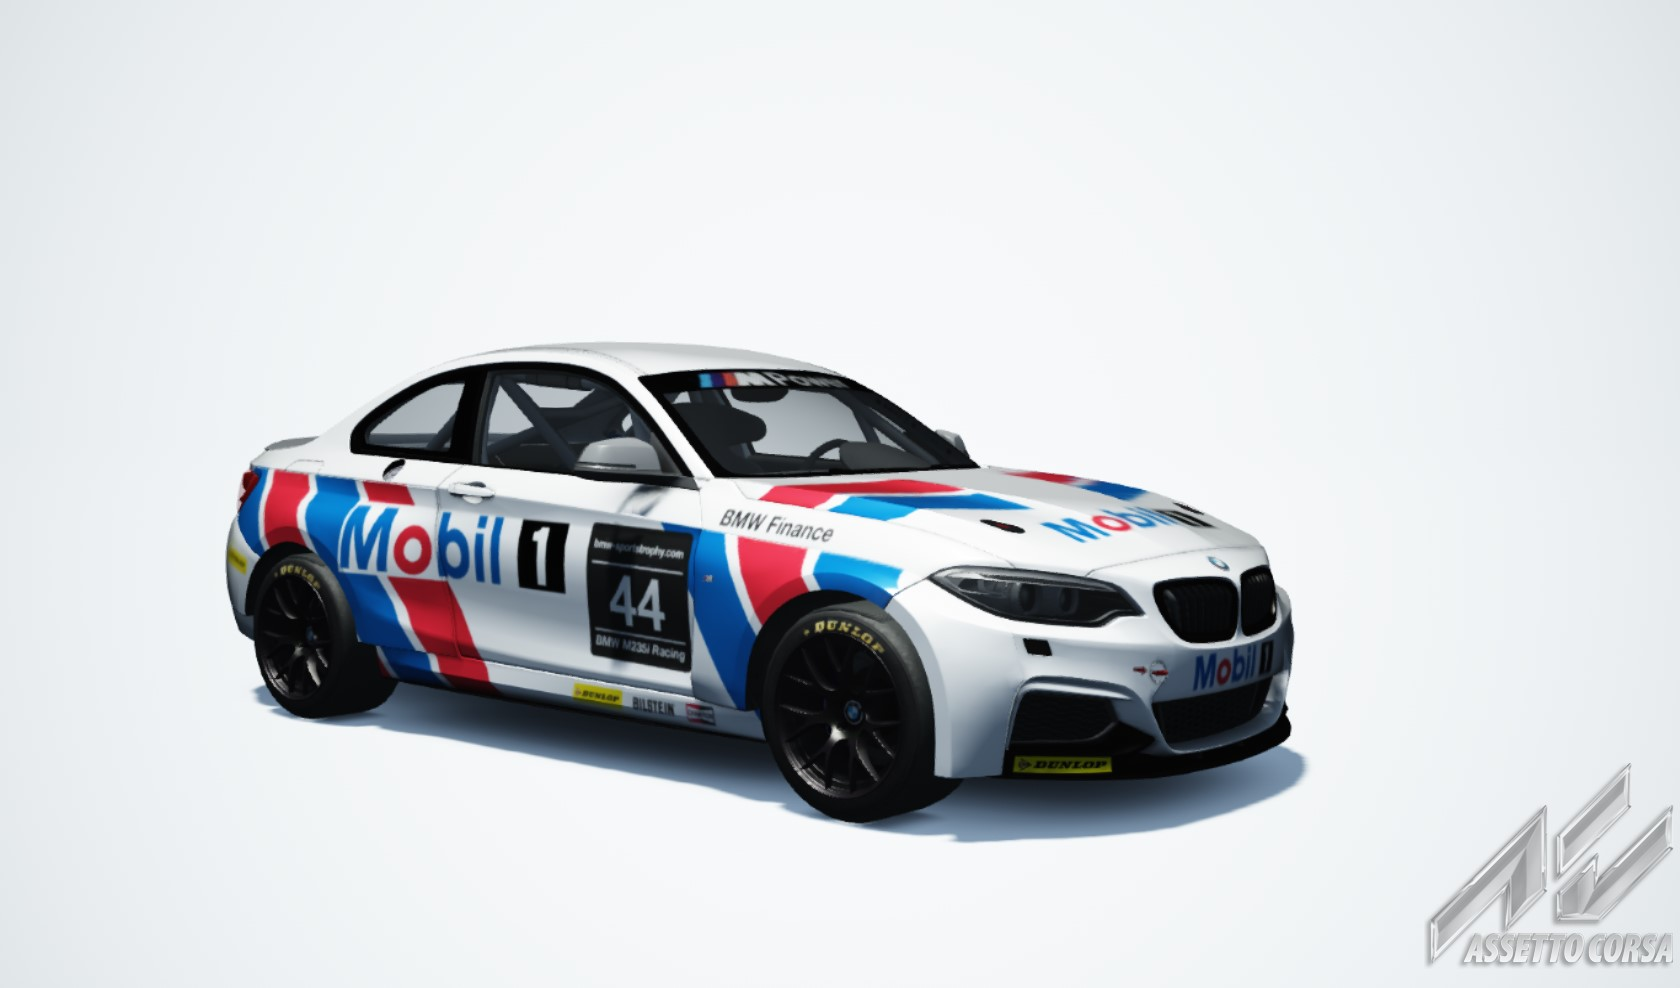 Showroom_ks_bmw_m235i_racing_21-11-2016-19-52-42.jpg